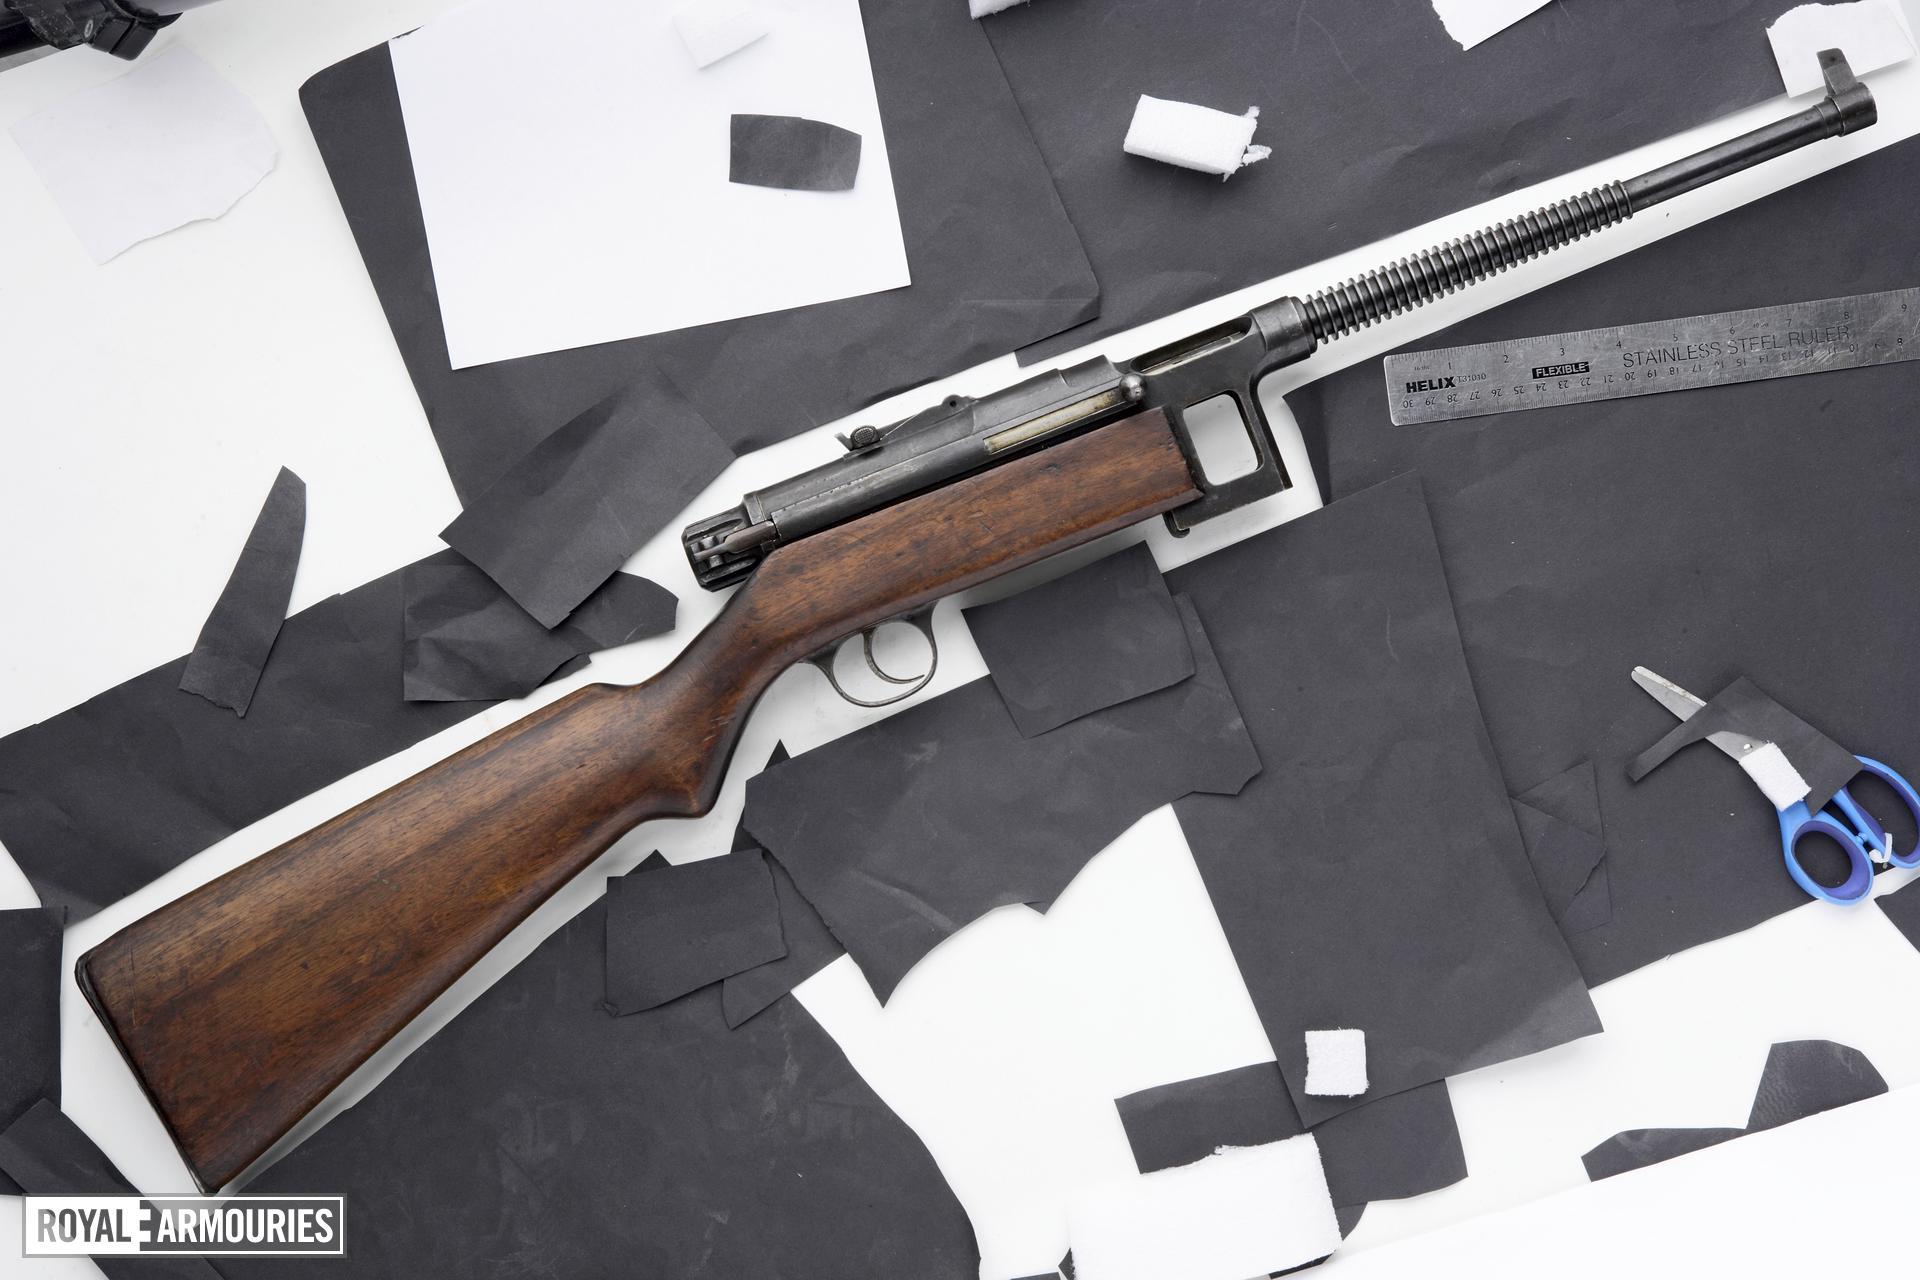 Centrefire automatic submachine gun - Star Model RU-1935